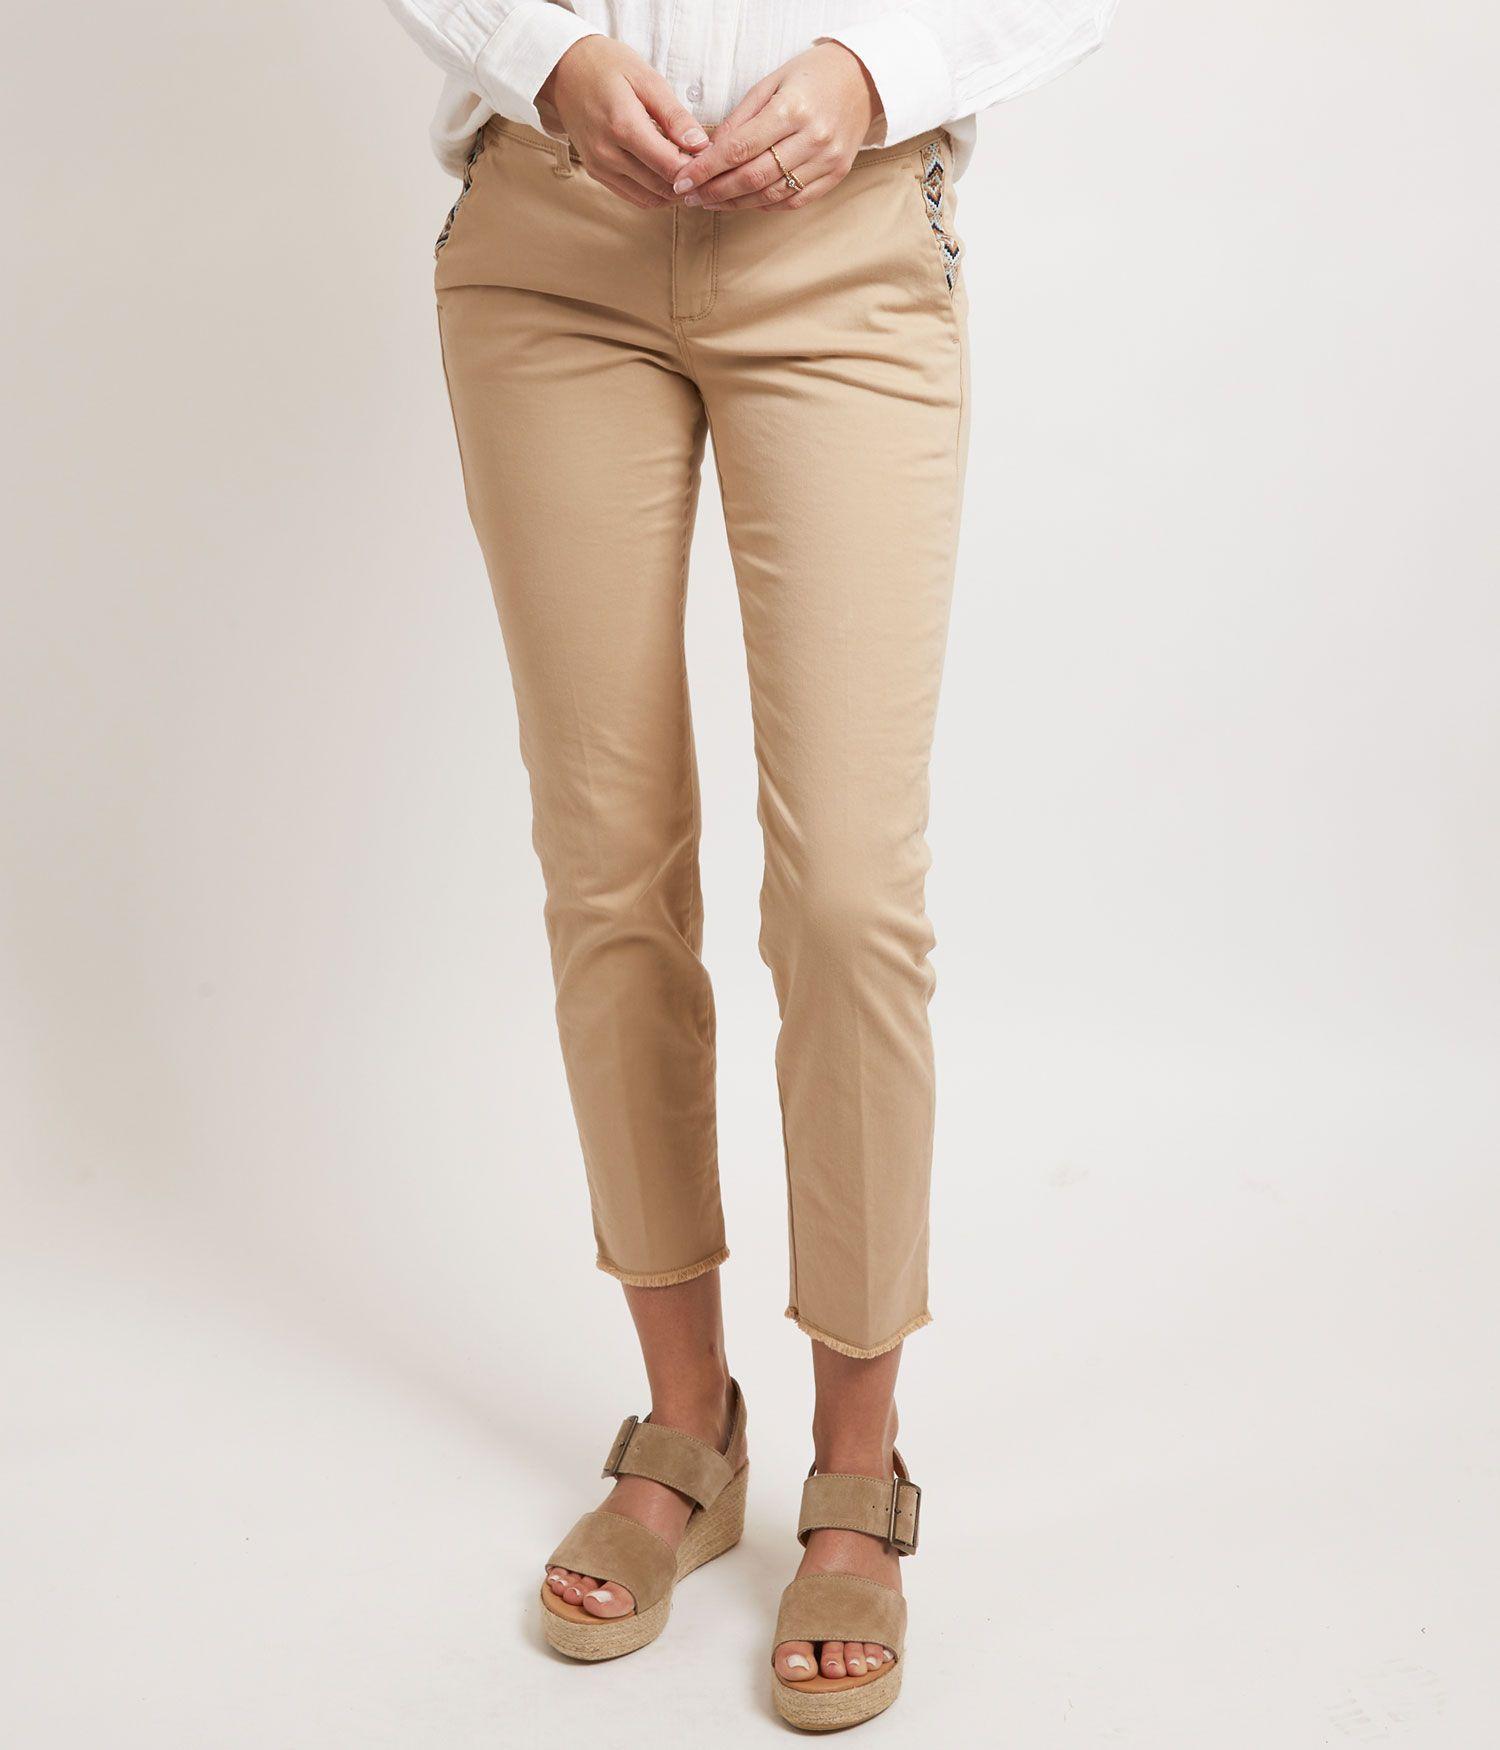 pantalon peace